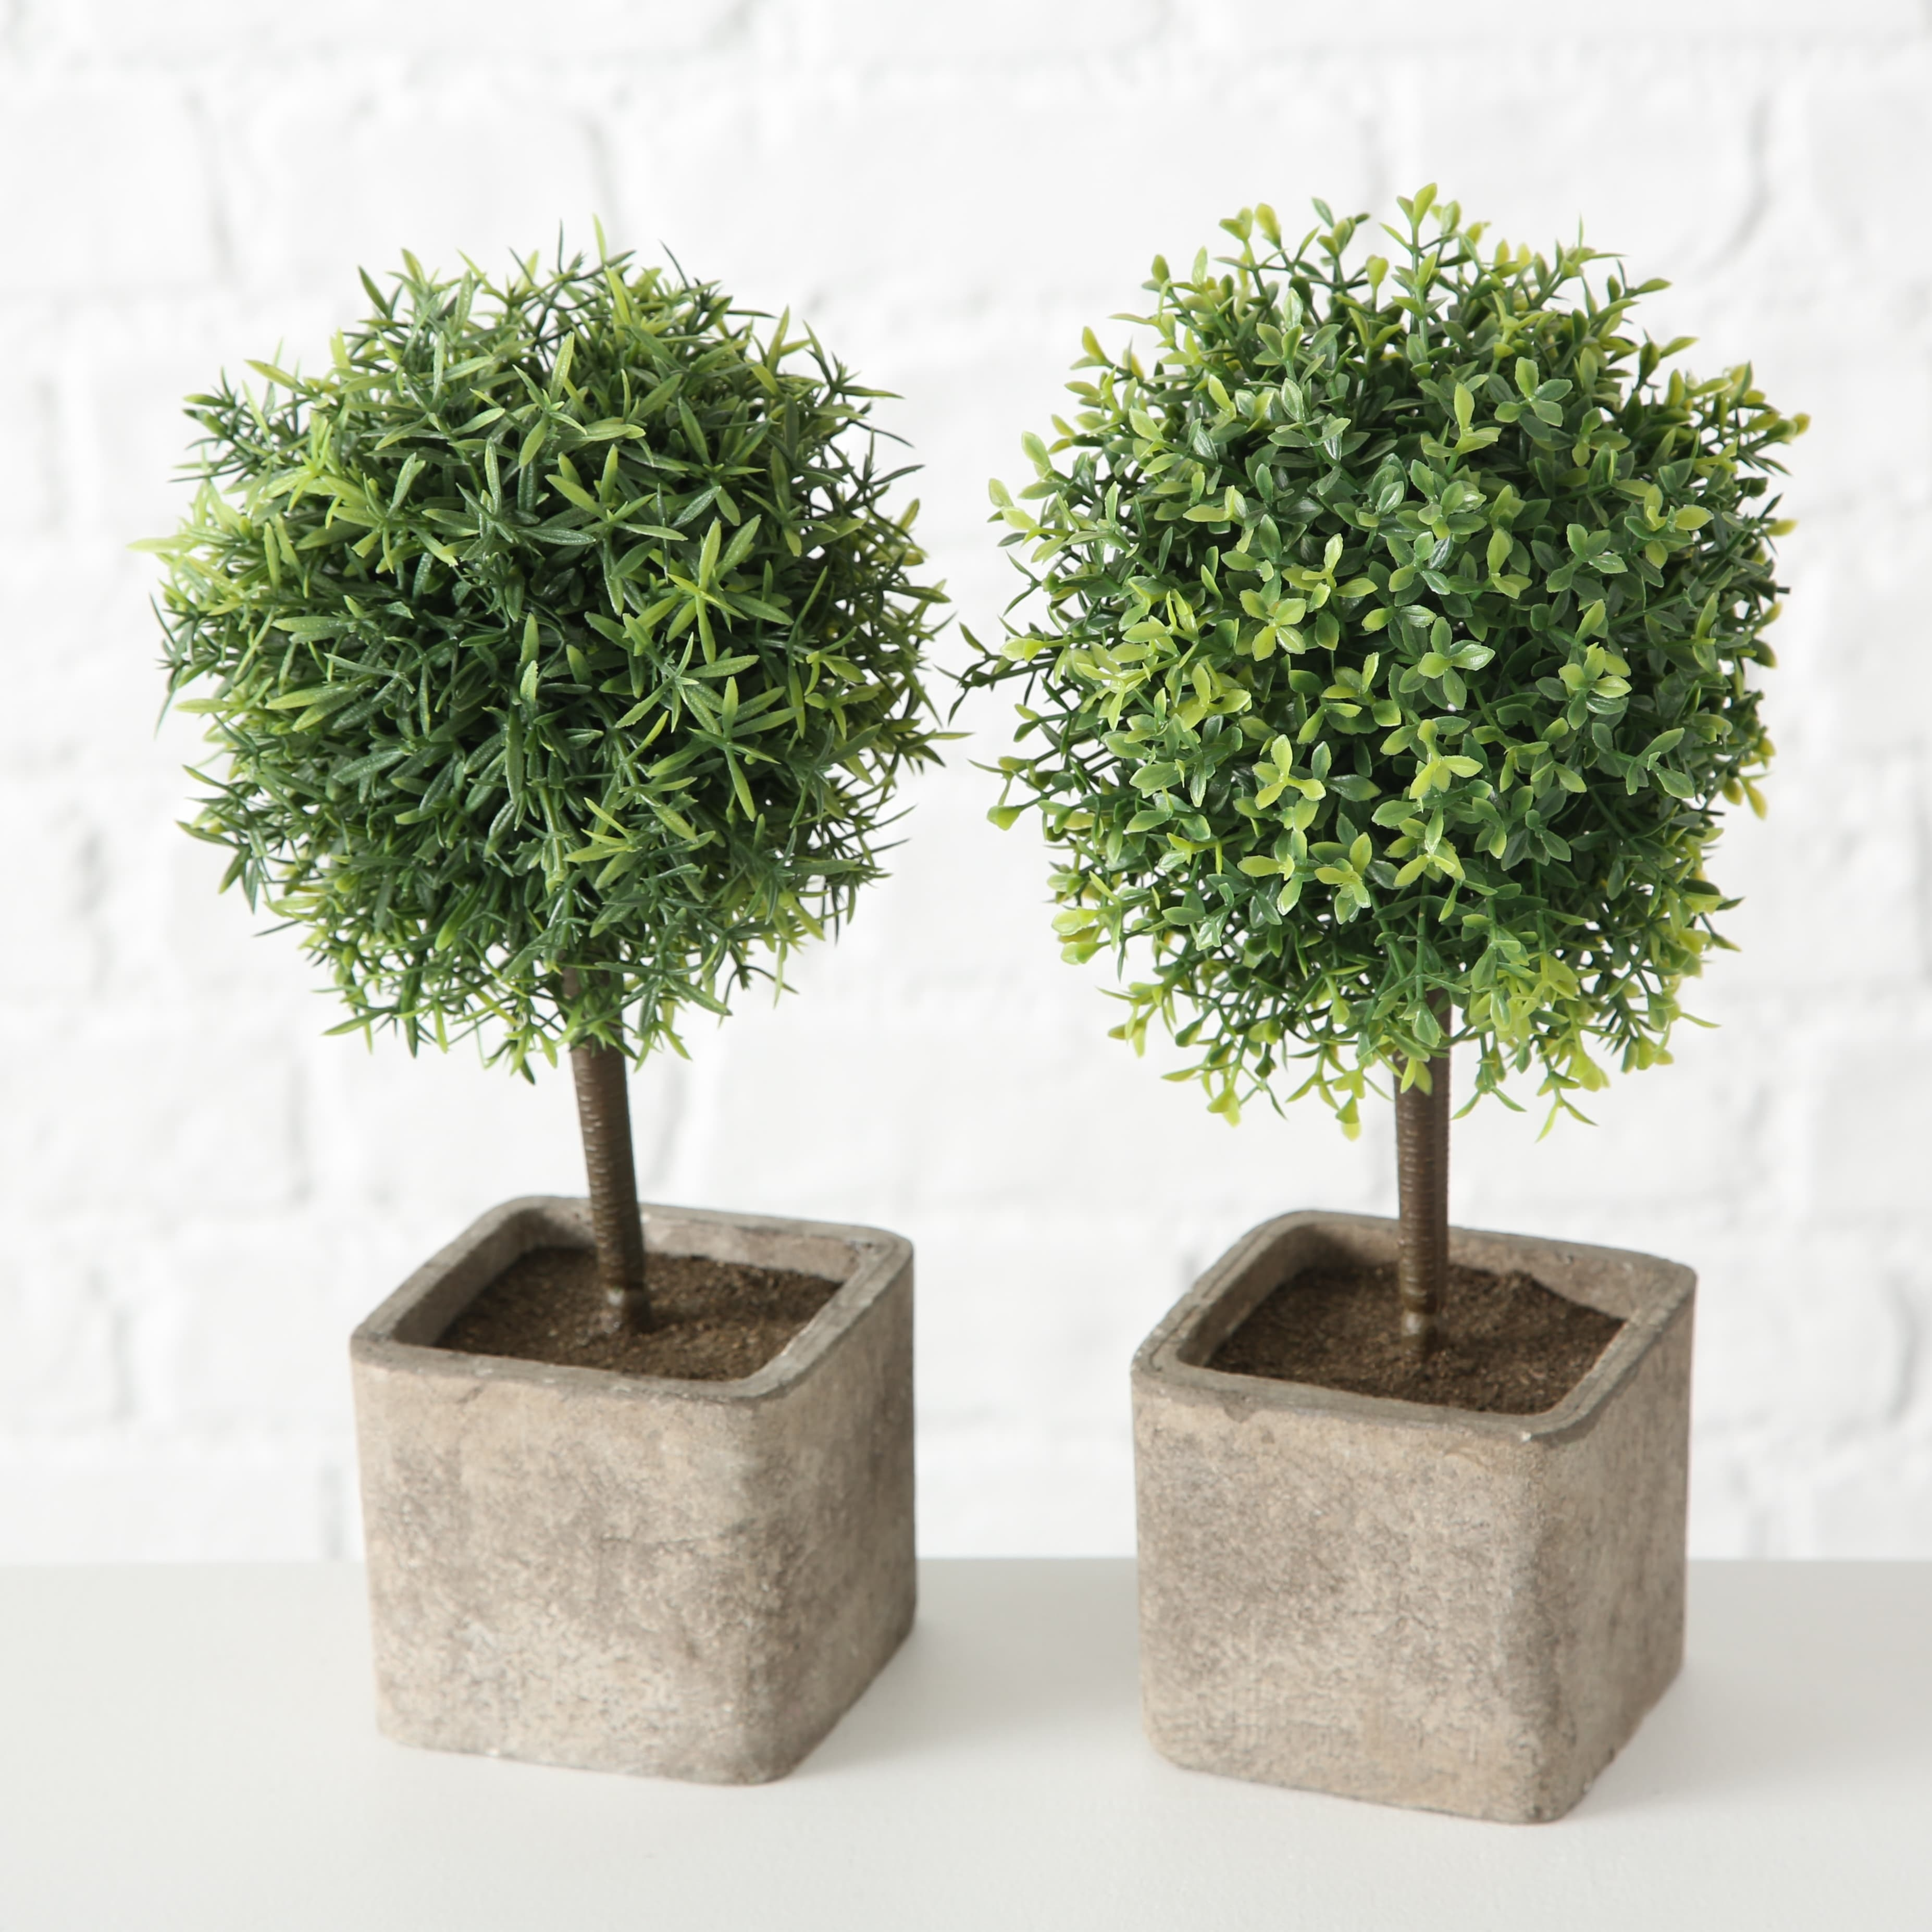 Planta artificiala in ghiveci Indoor Tree Verde / Gri, Modele Asortate, H26 cm poza